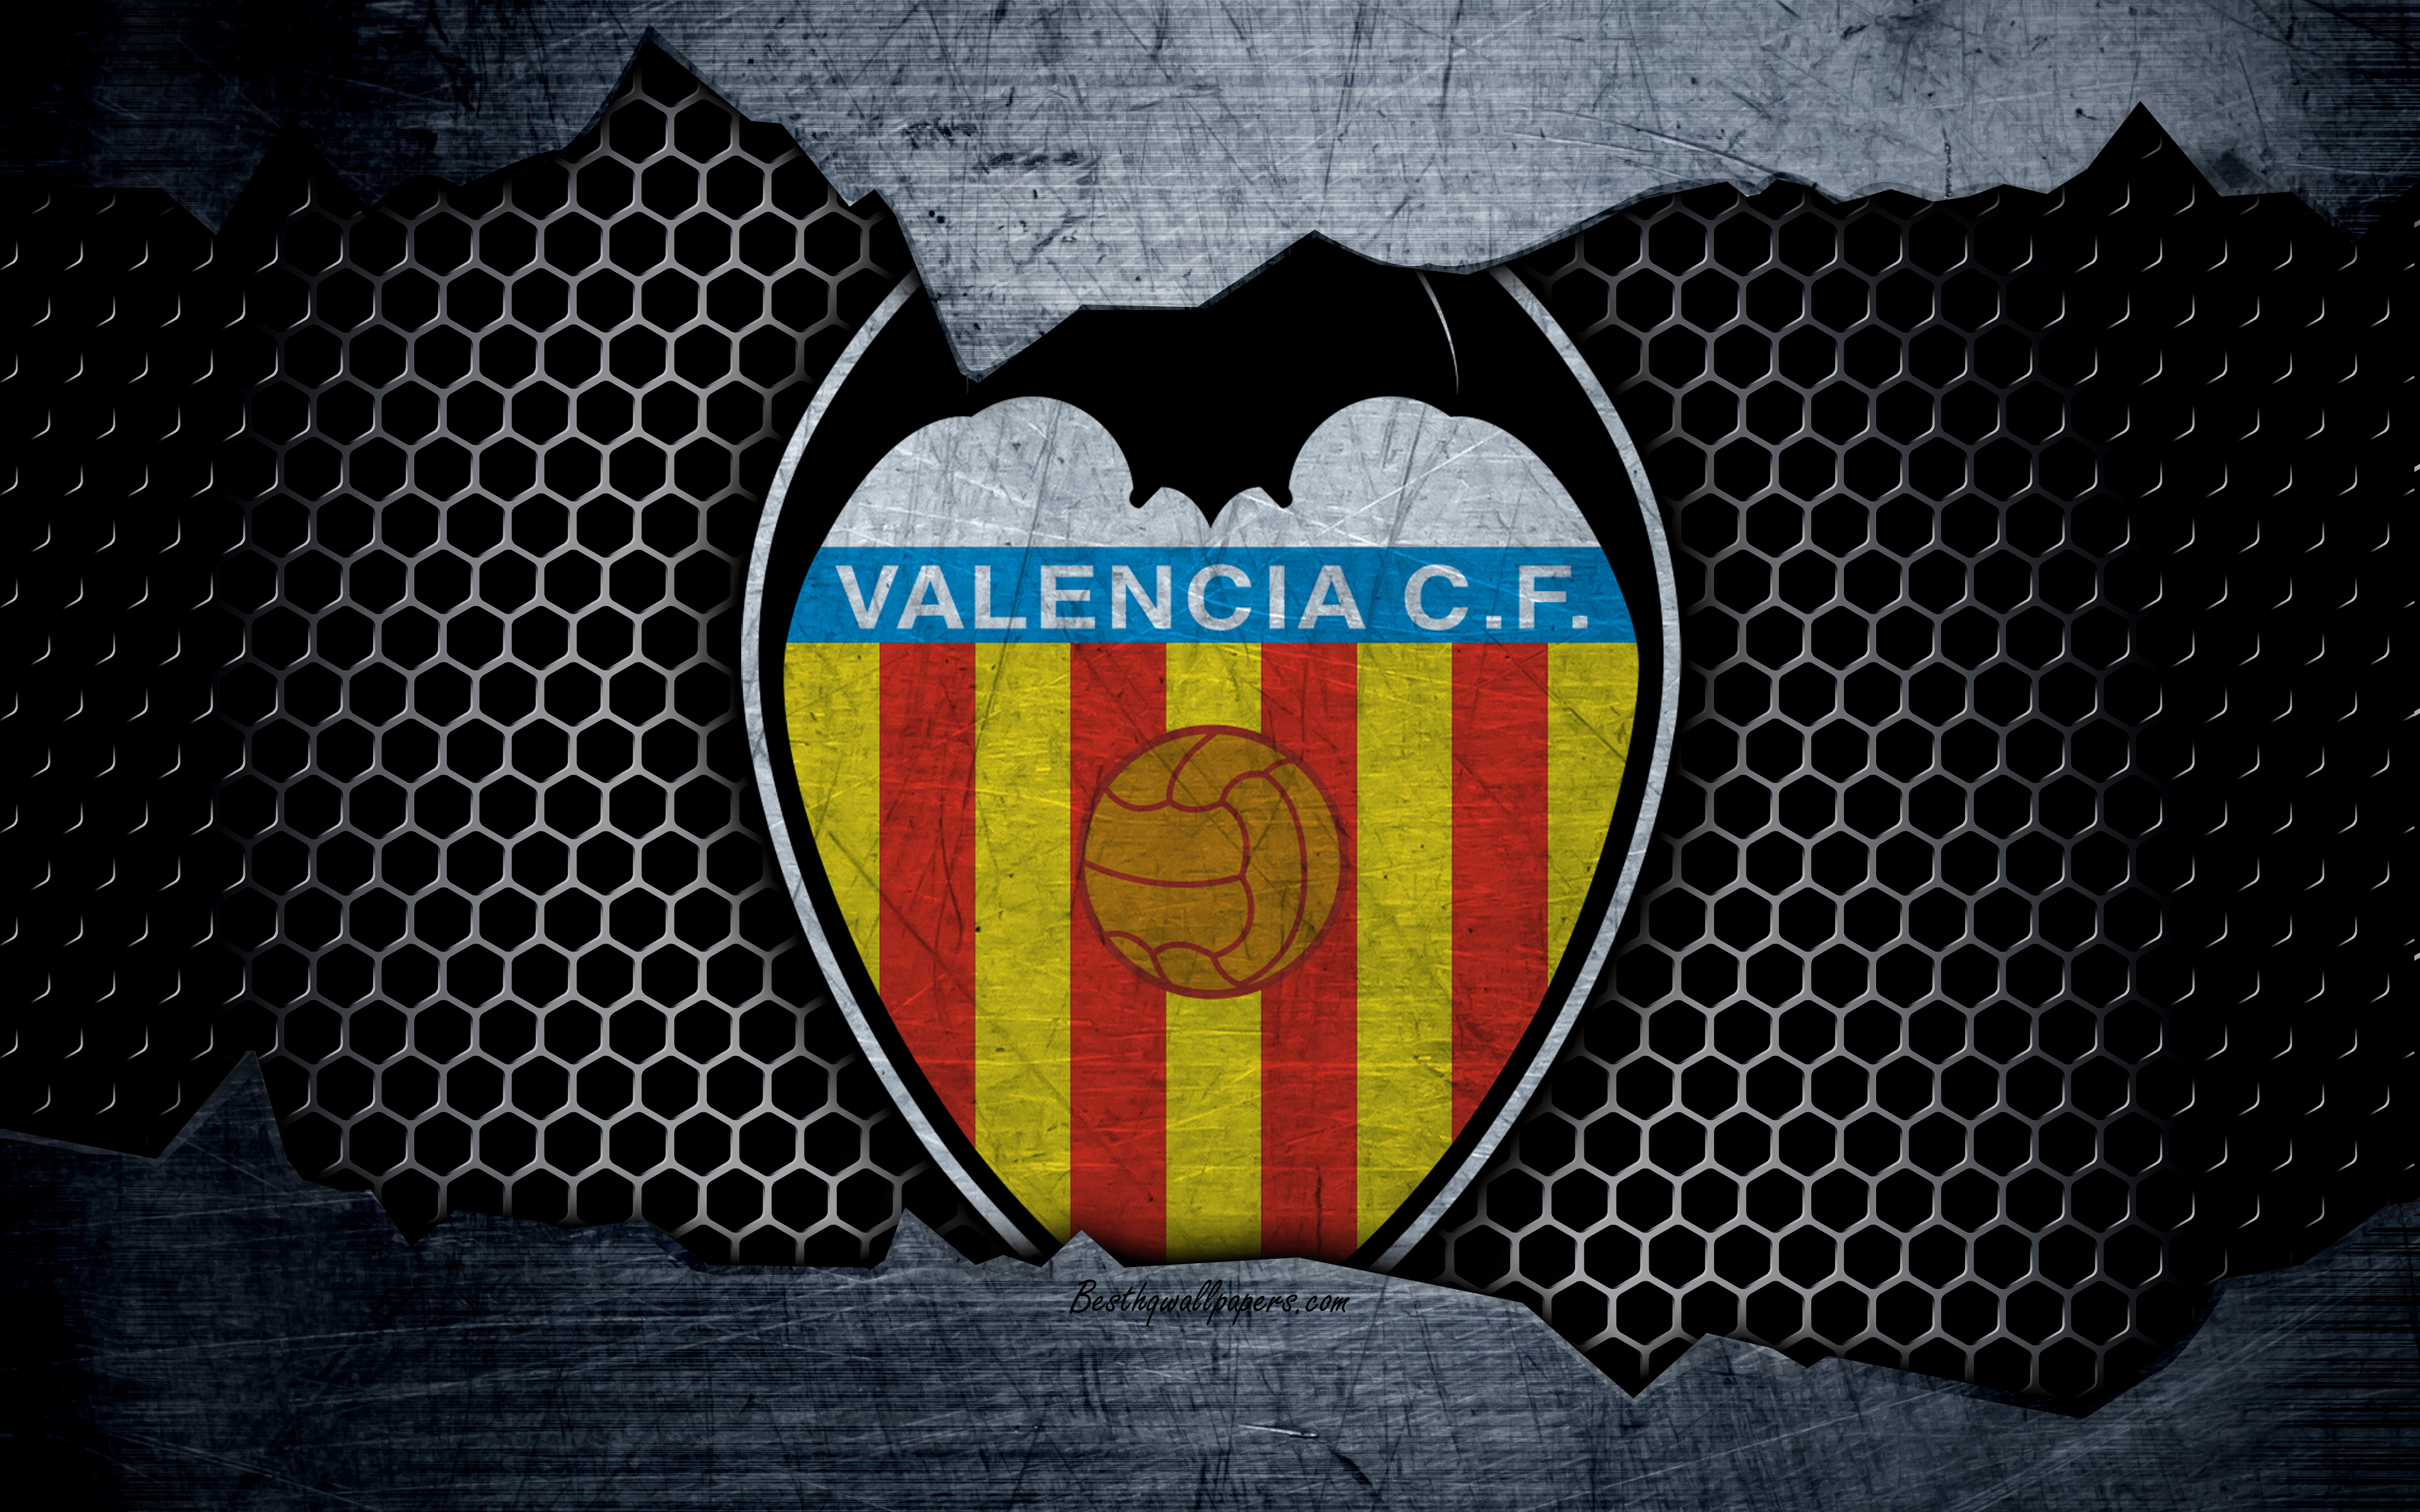 Valencia Cf 4k Ultra Hd Wallpaper Rhyolite 2152735 Hd